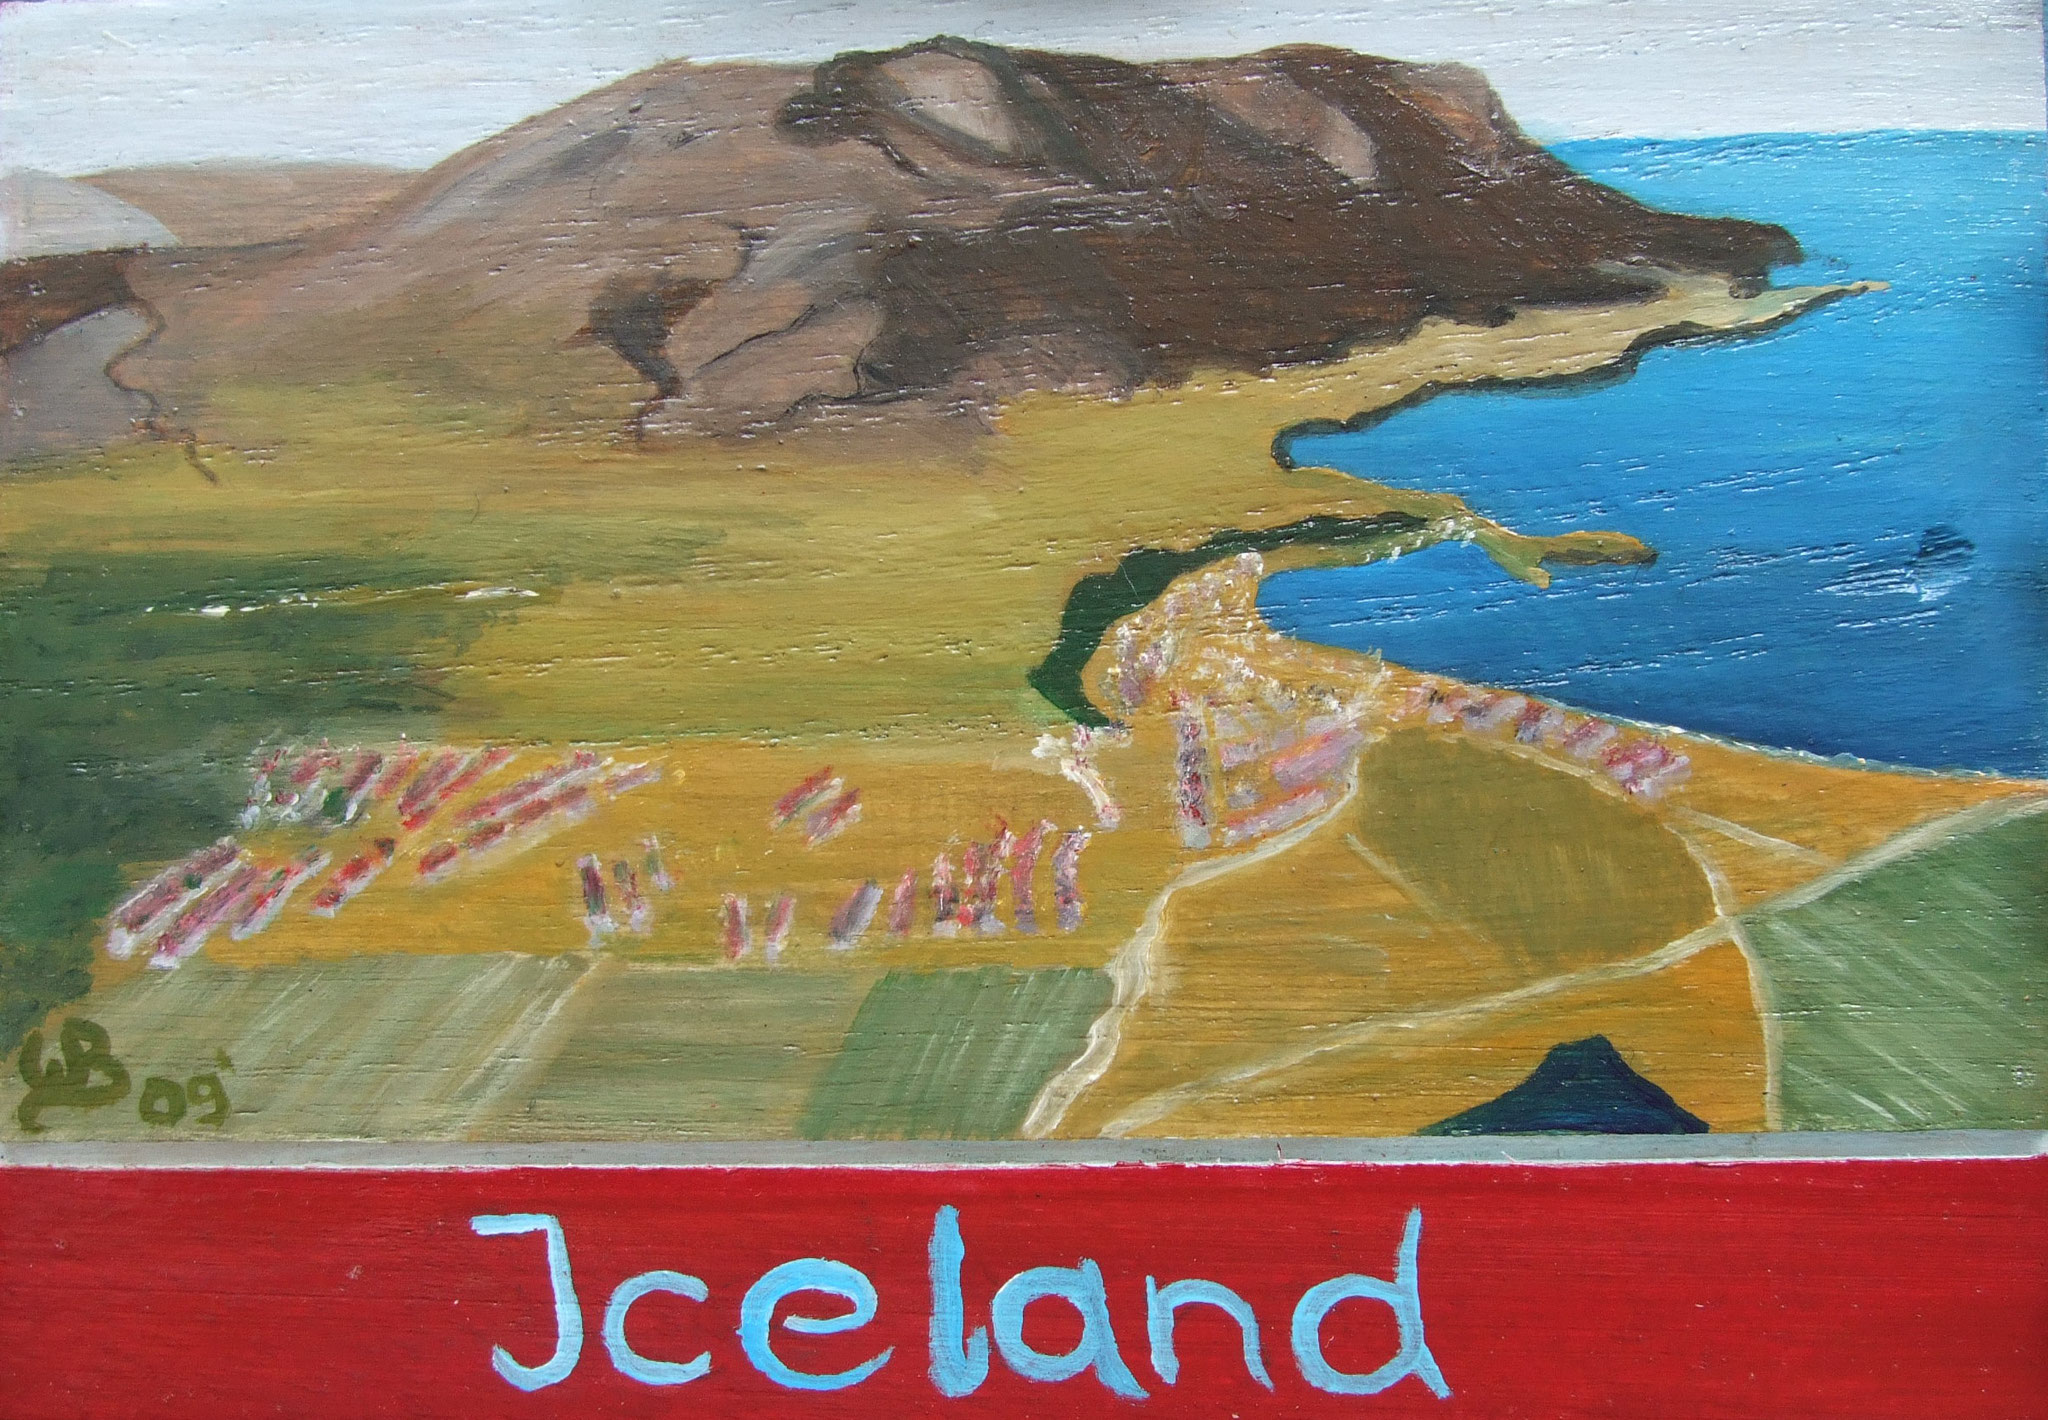 Iceland (2009)